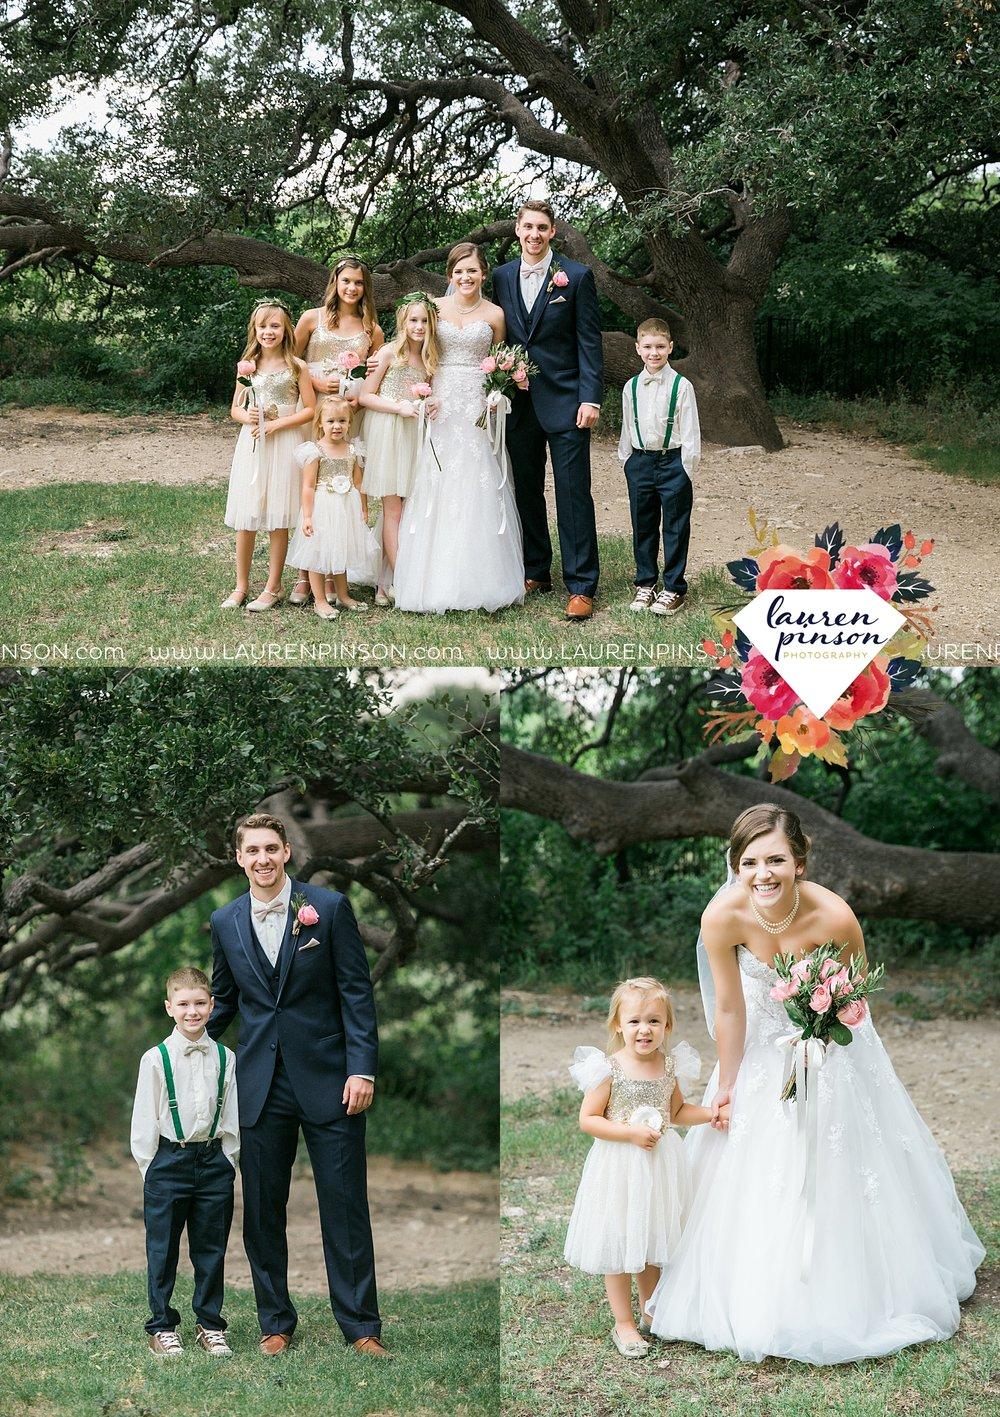 austin-texas-barn-wedding-at-brodie-homestead-wichita-falls-tx-wedding-photographer-dfw-00033.jpg